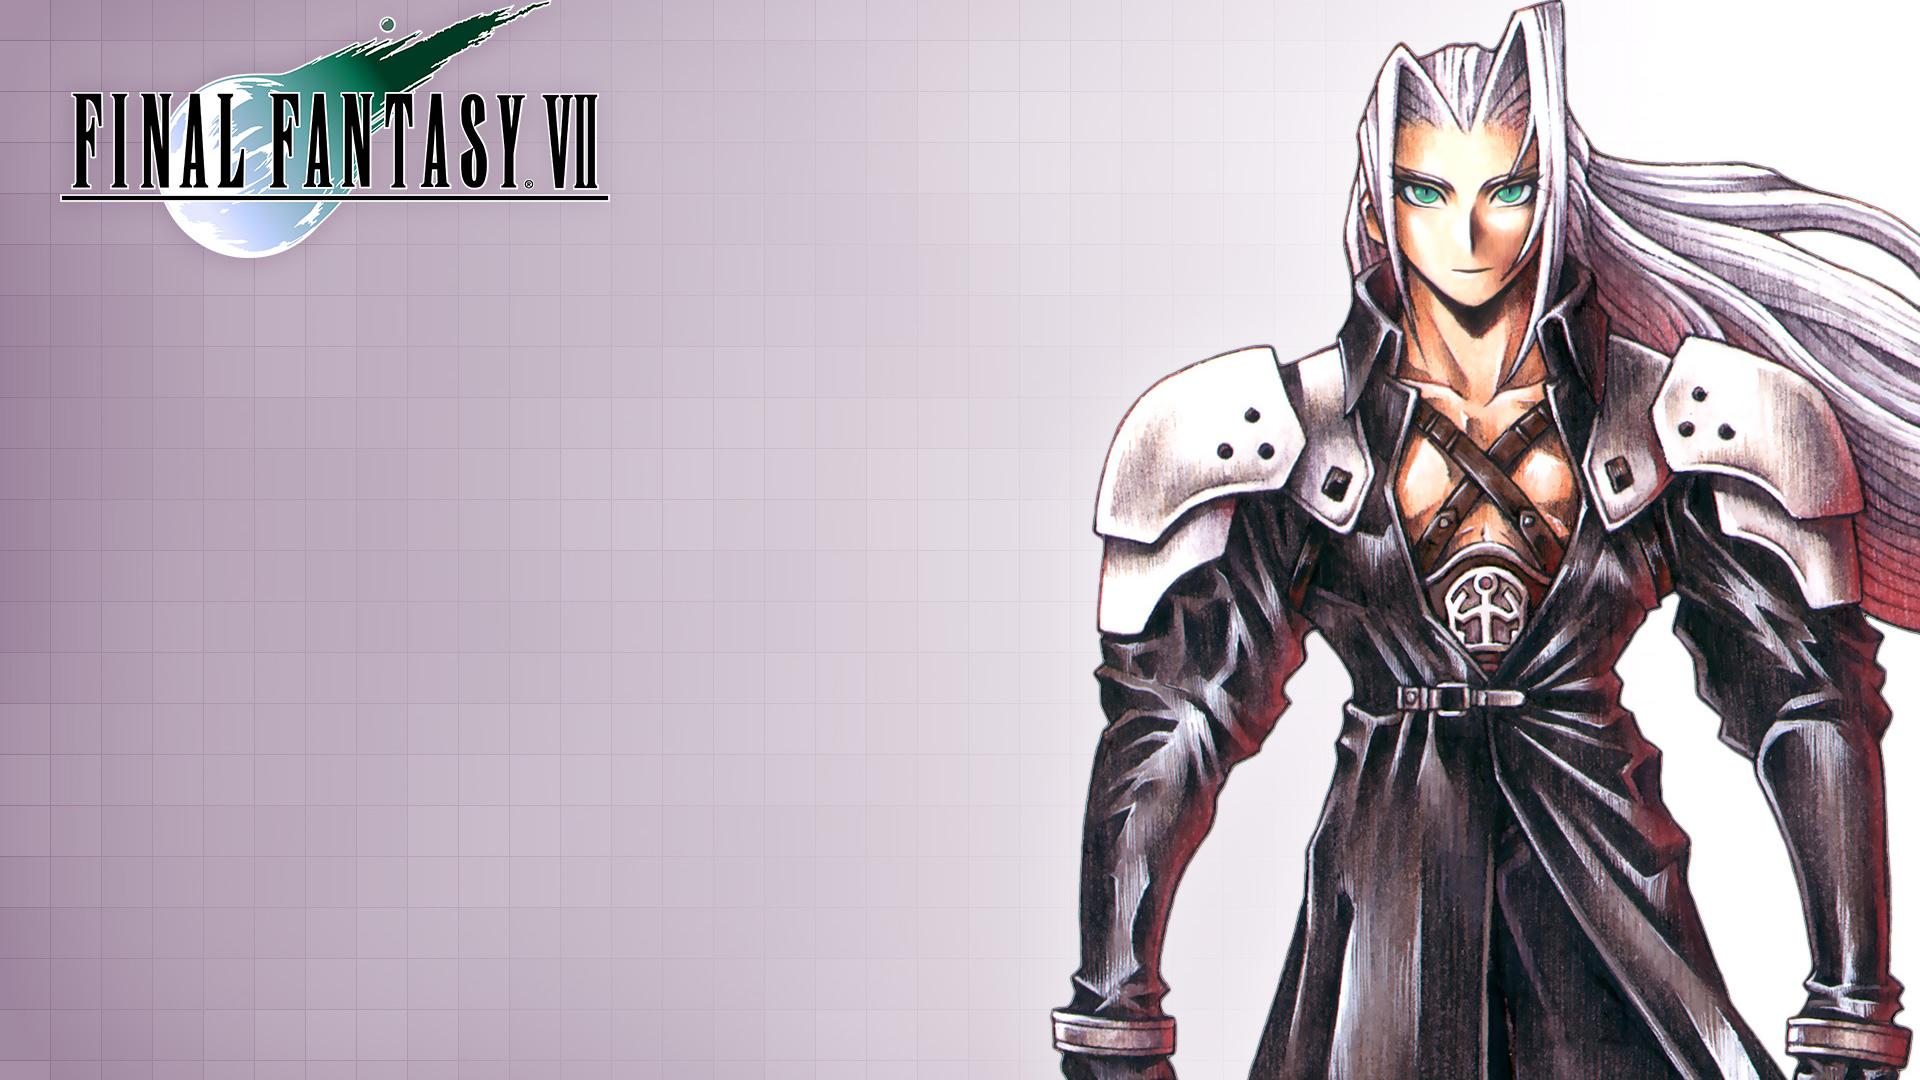 Free Final Fantasy VII Wallpaper in 1920x1080